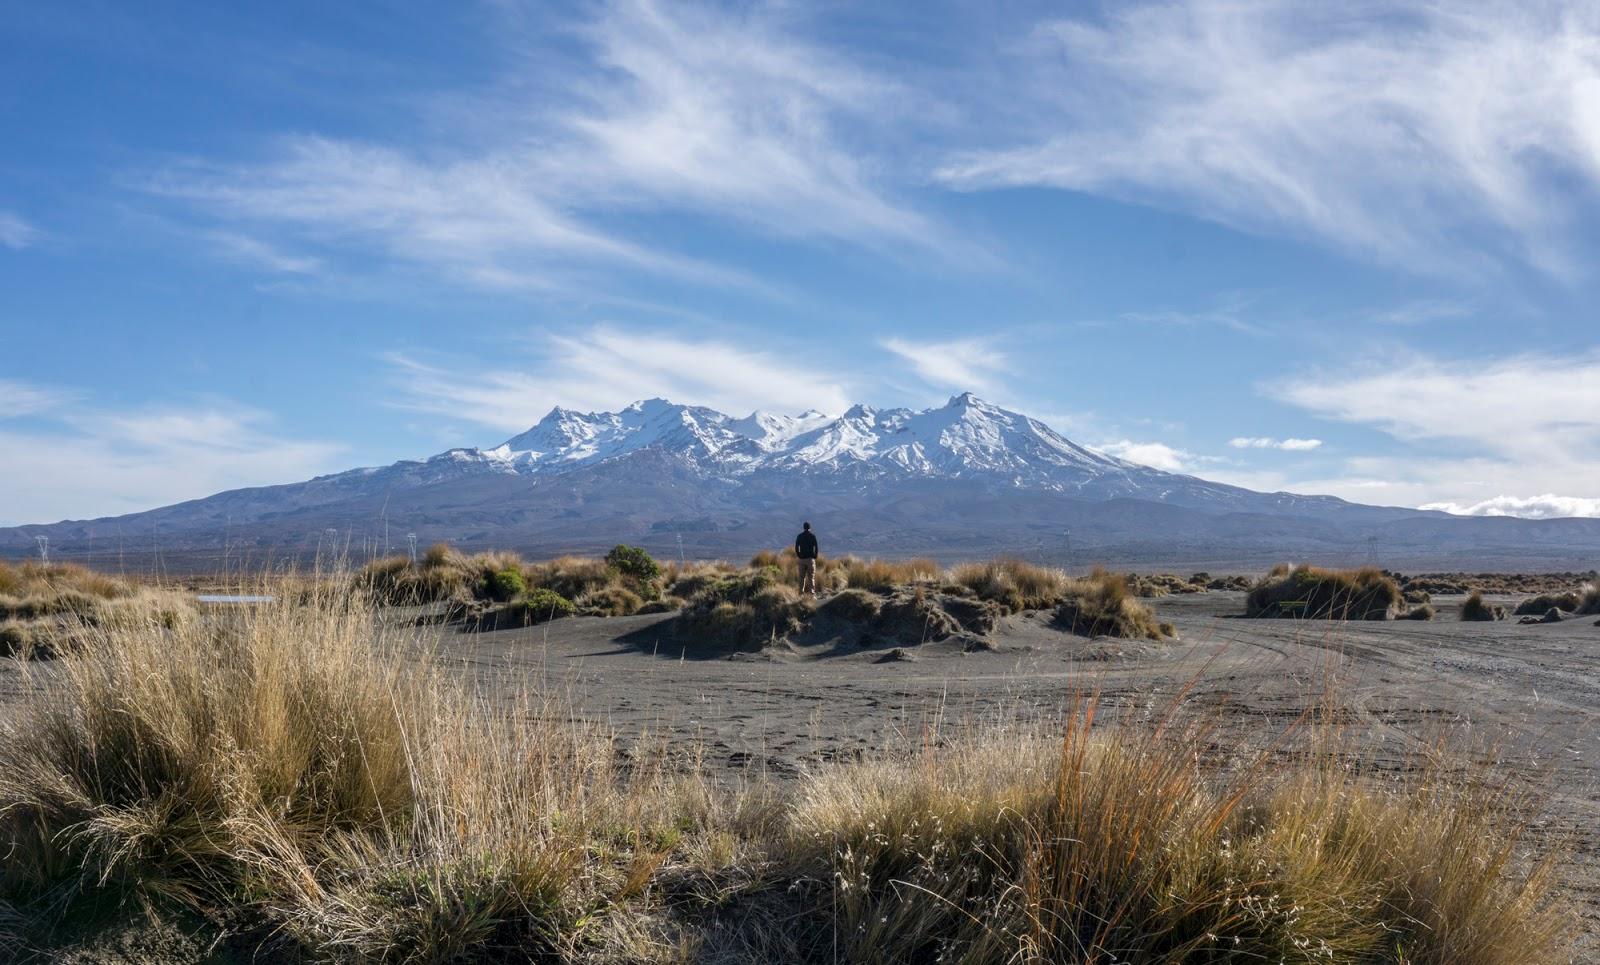 Turangi New Zealand  city photos gallery : ... Week 22: NEW ZEALAND Auckland → Rotorua → Turangi → Whanganui